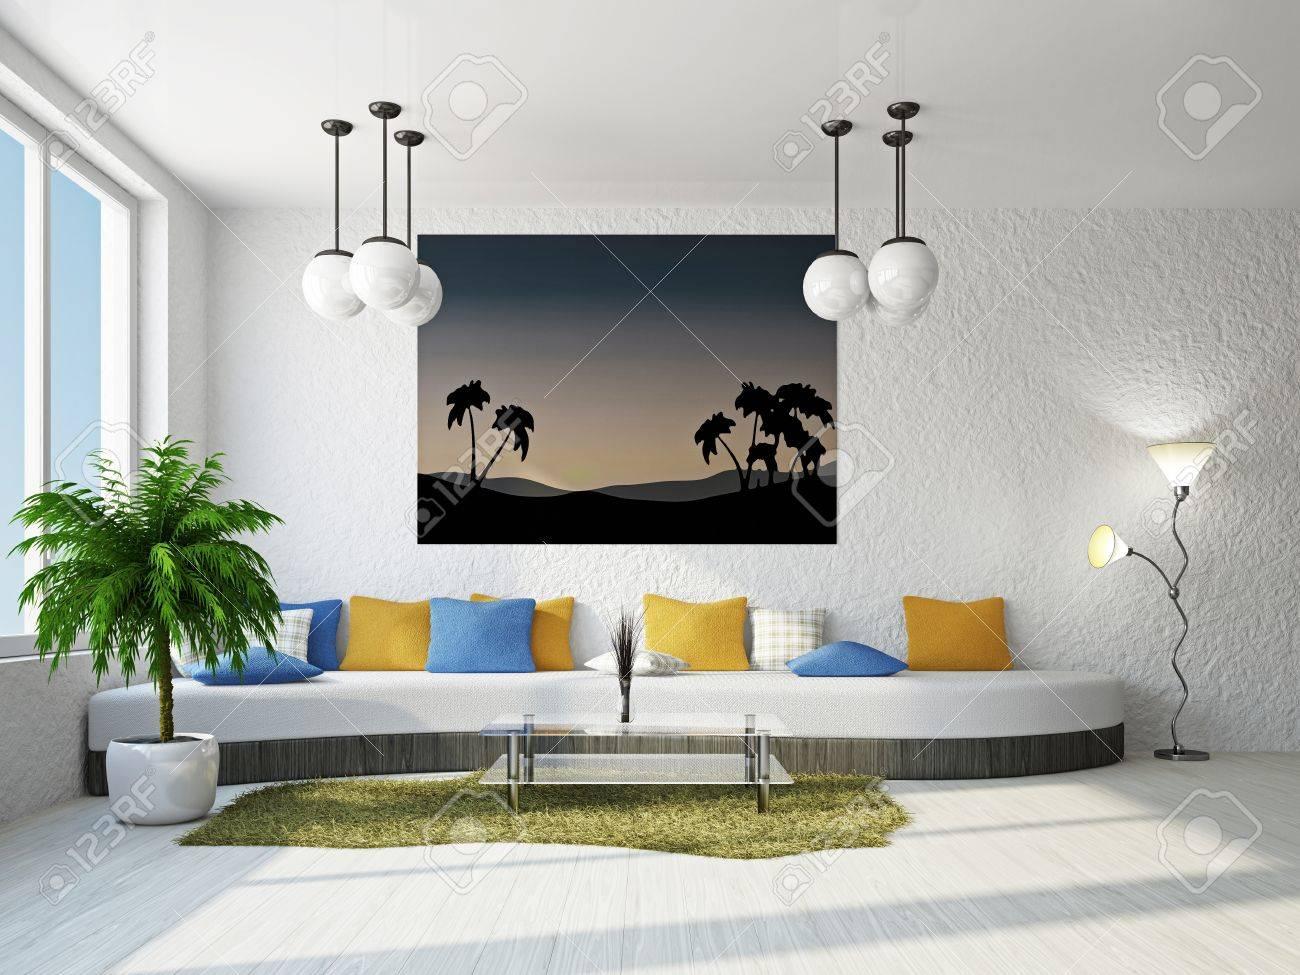 Livingroom with big sofa near the wall Stock Photo - 18902590